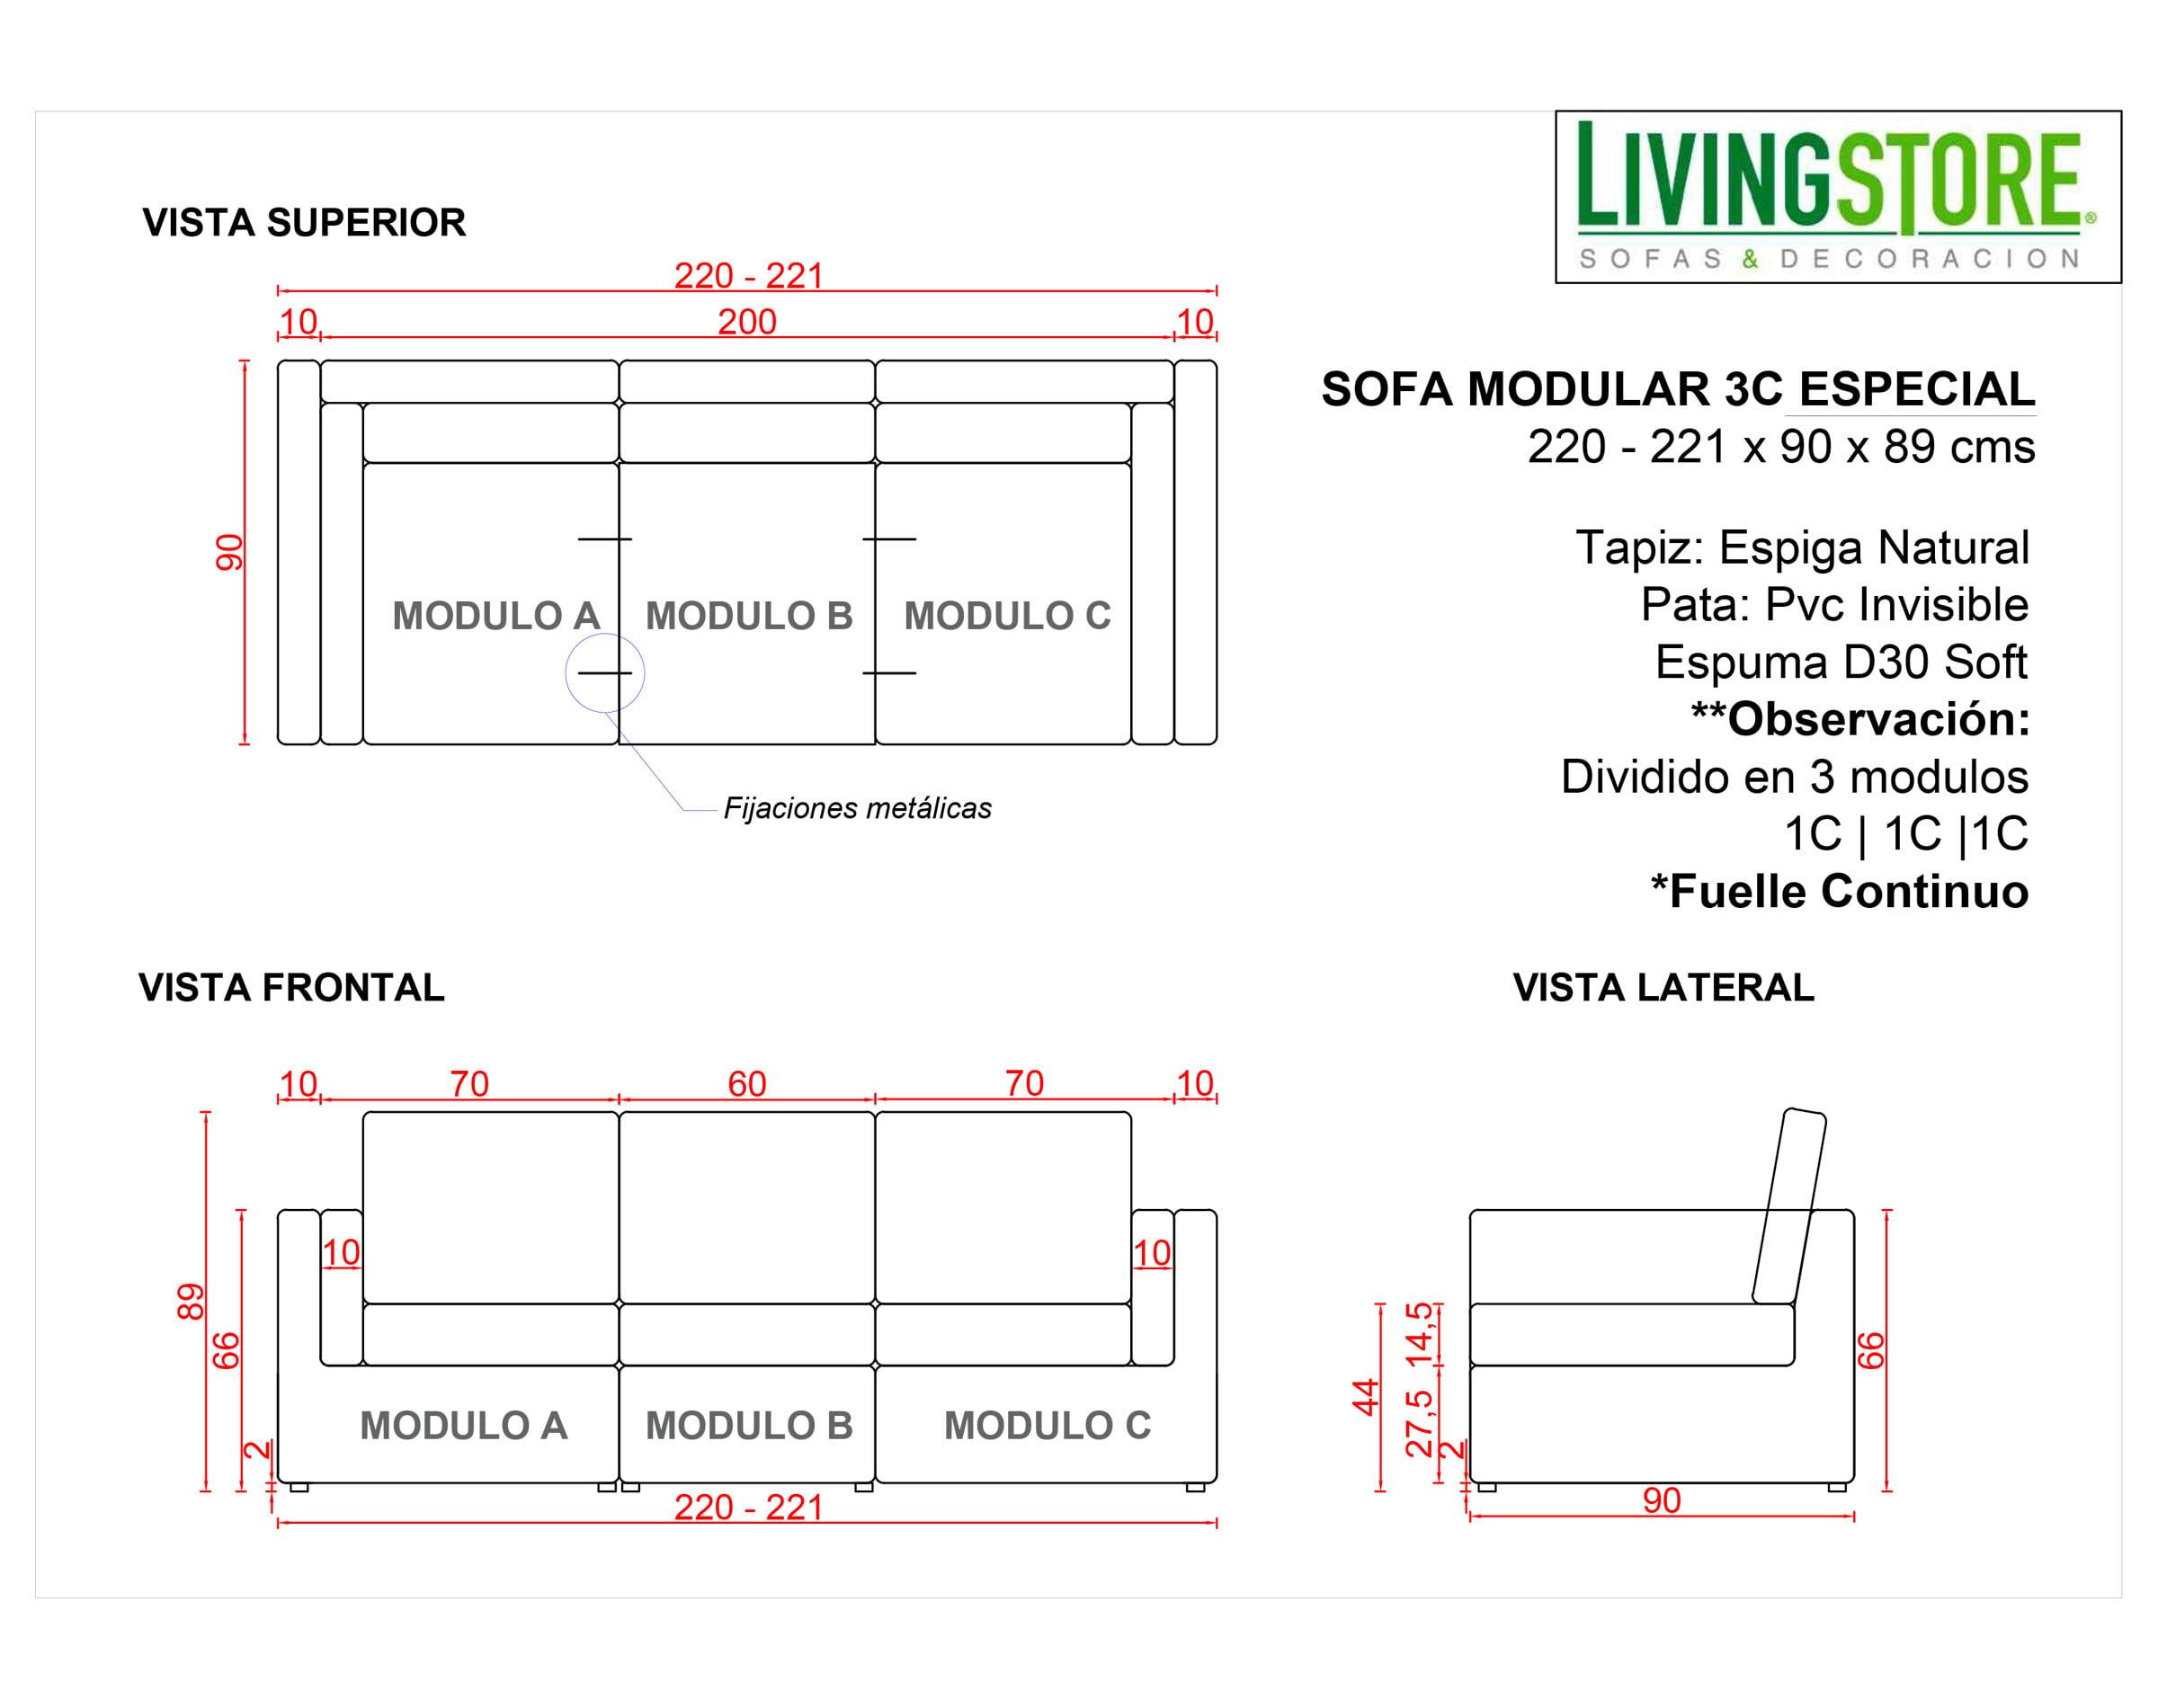 Planimetria Sofa Modular Espiga Natural